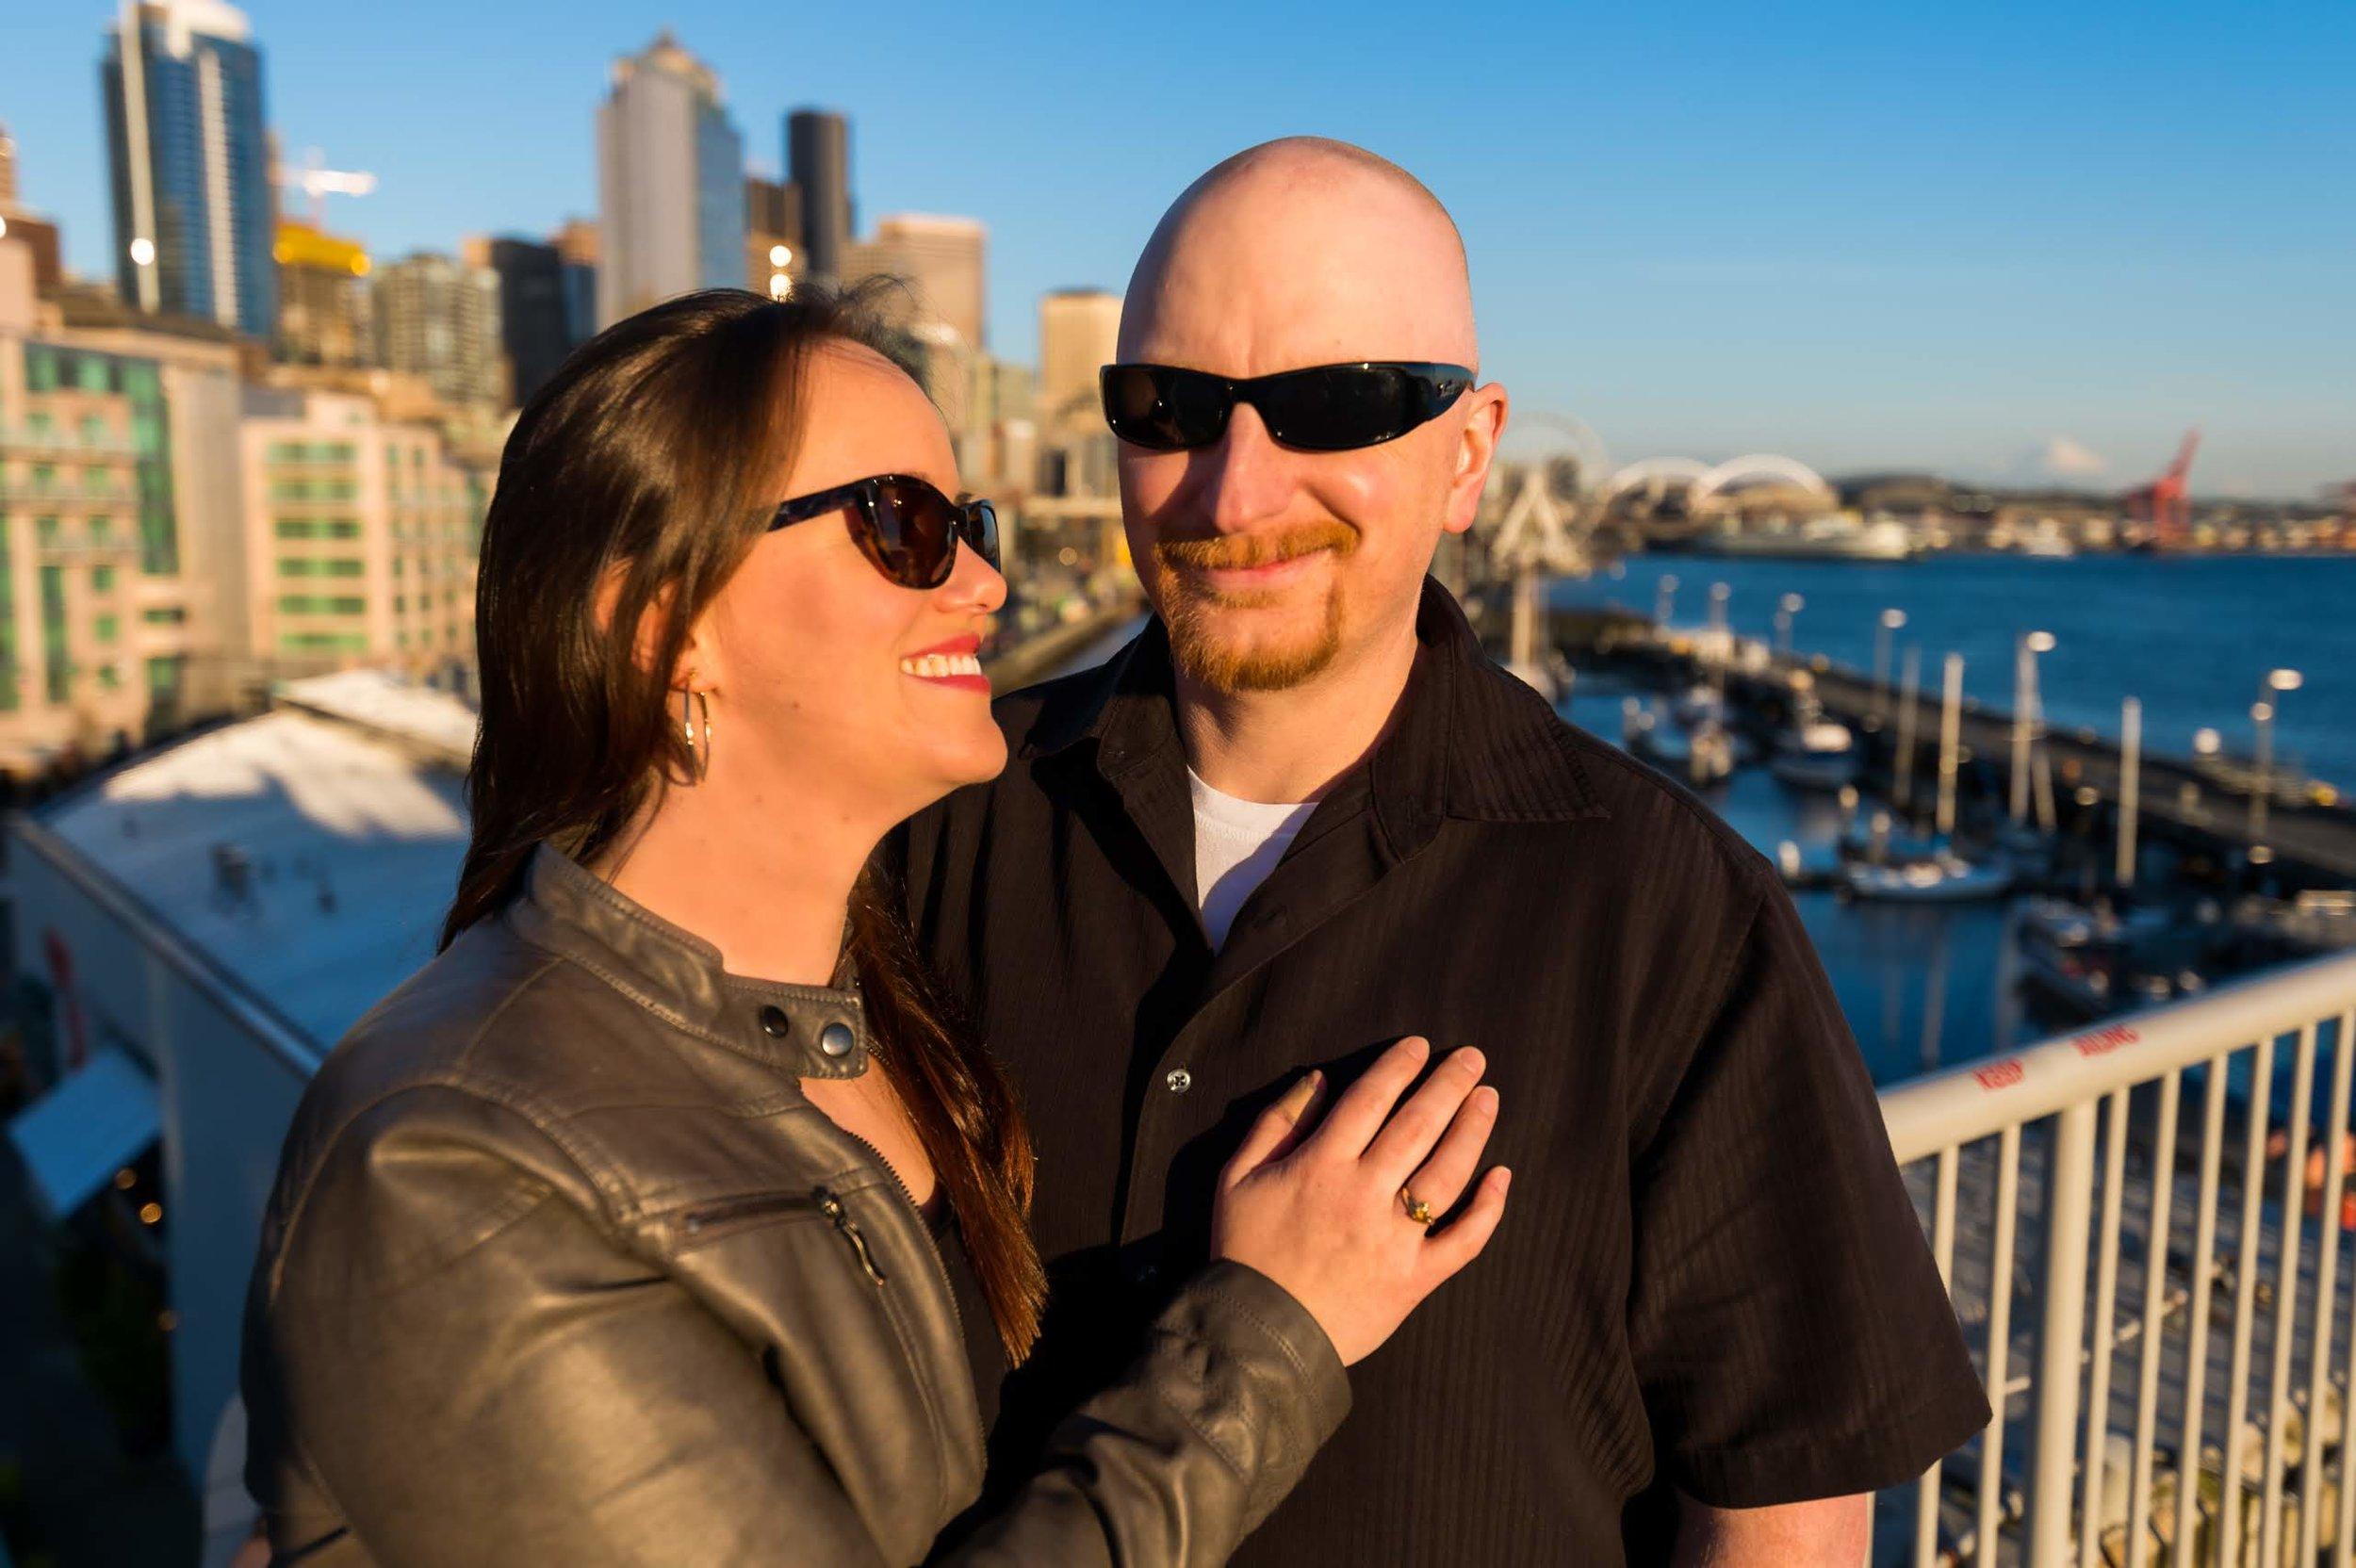 Sarah_Chris_Engagement-002.jpg